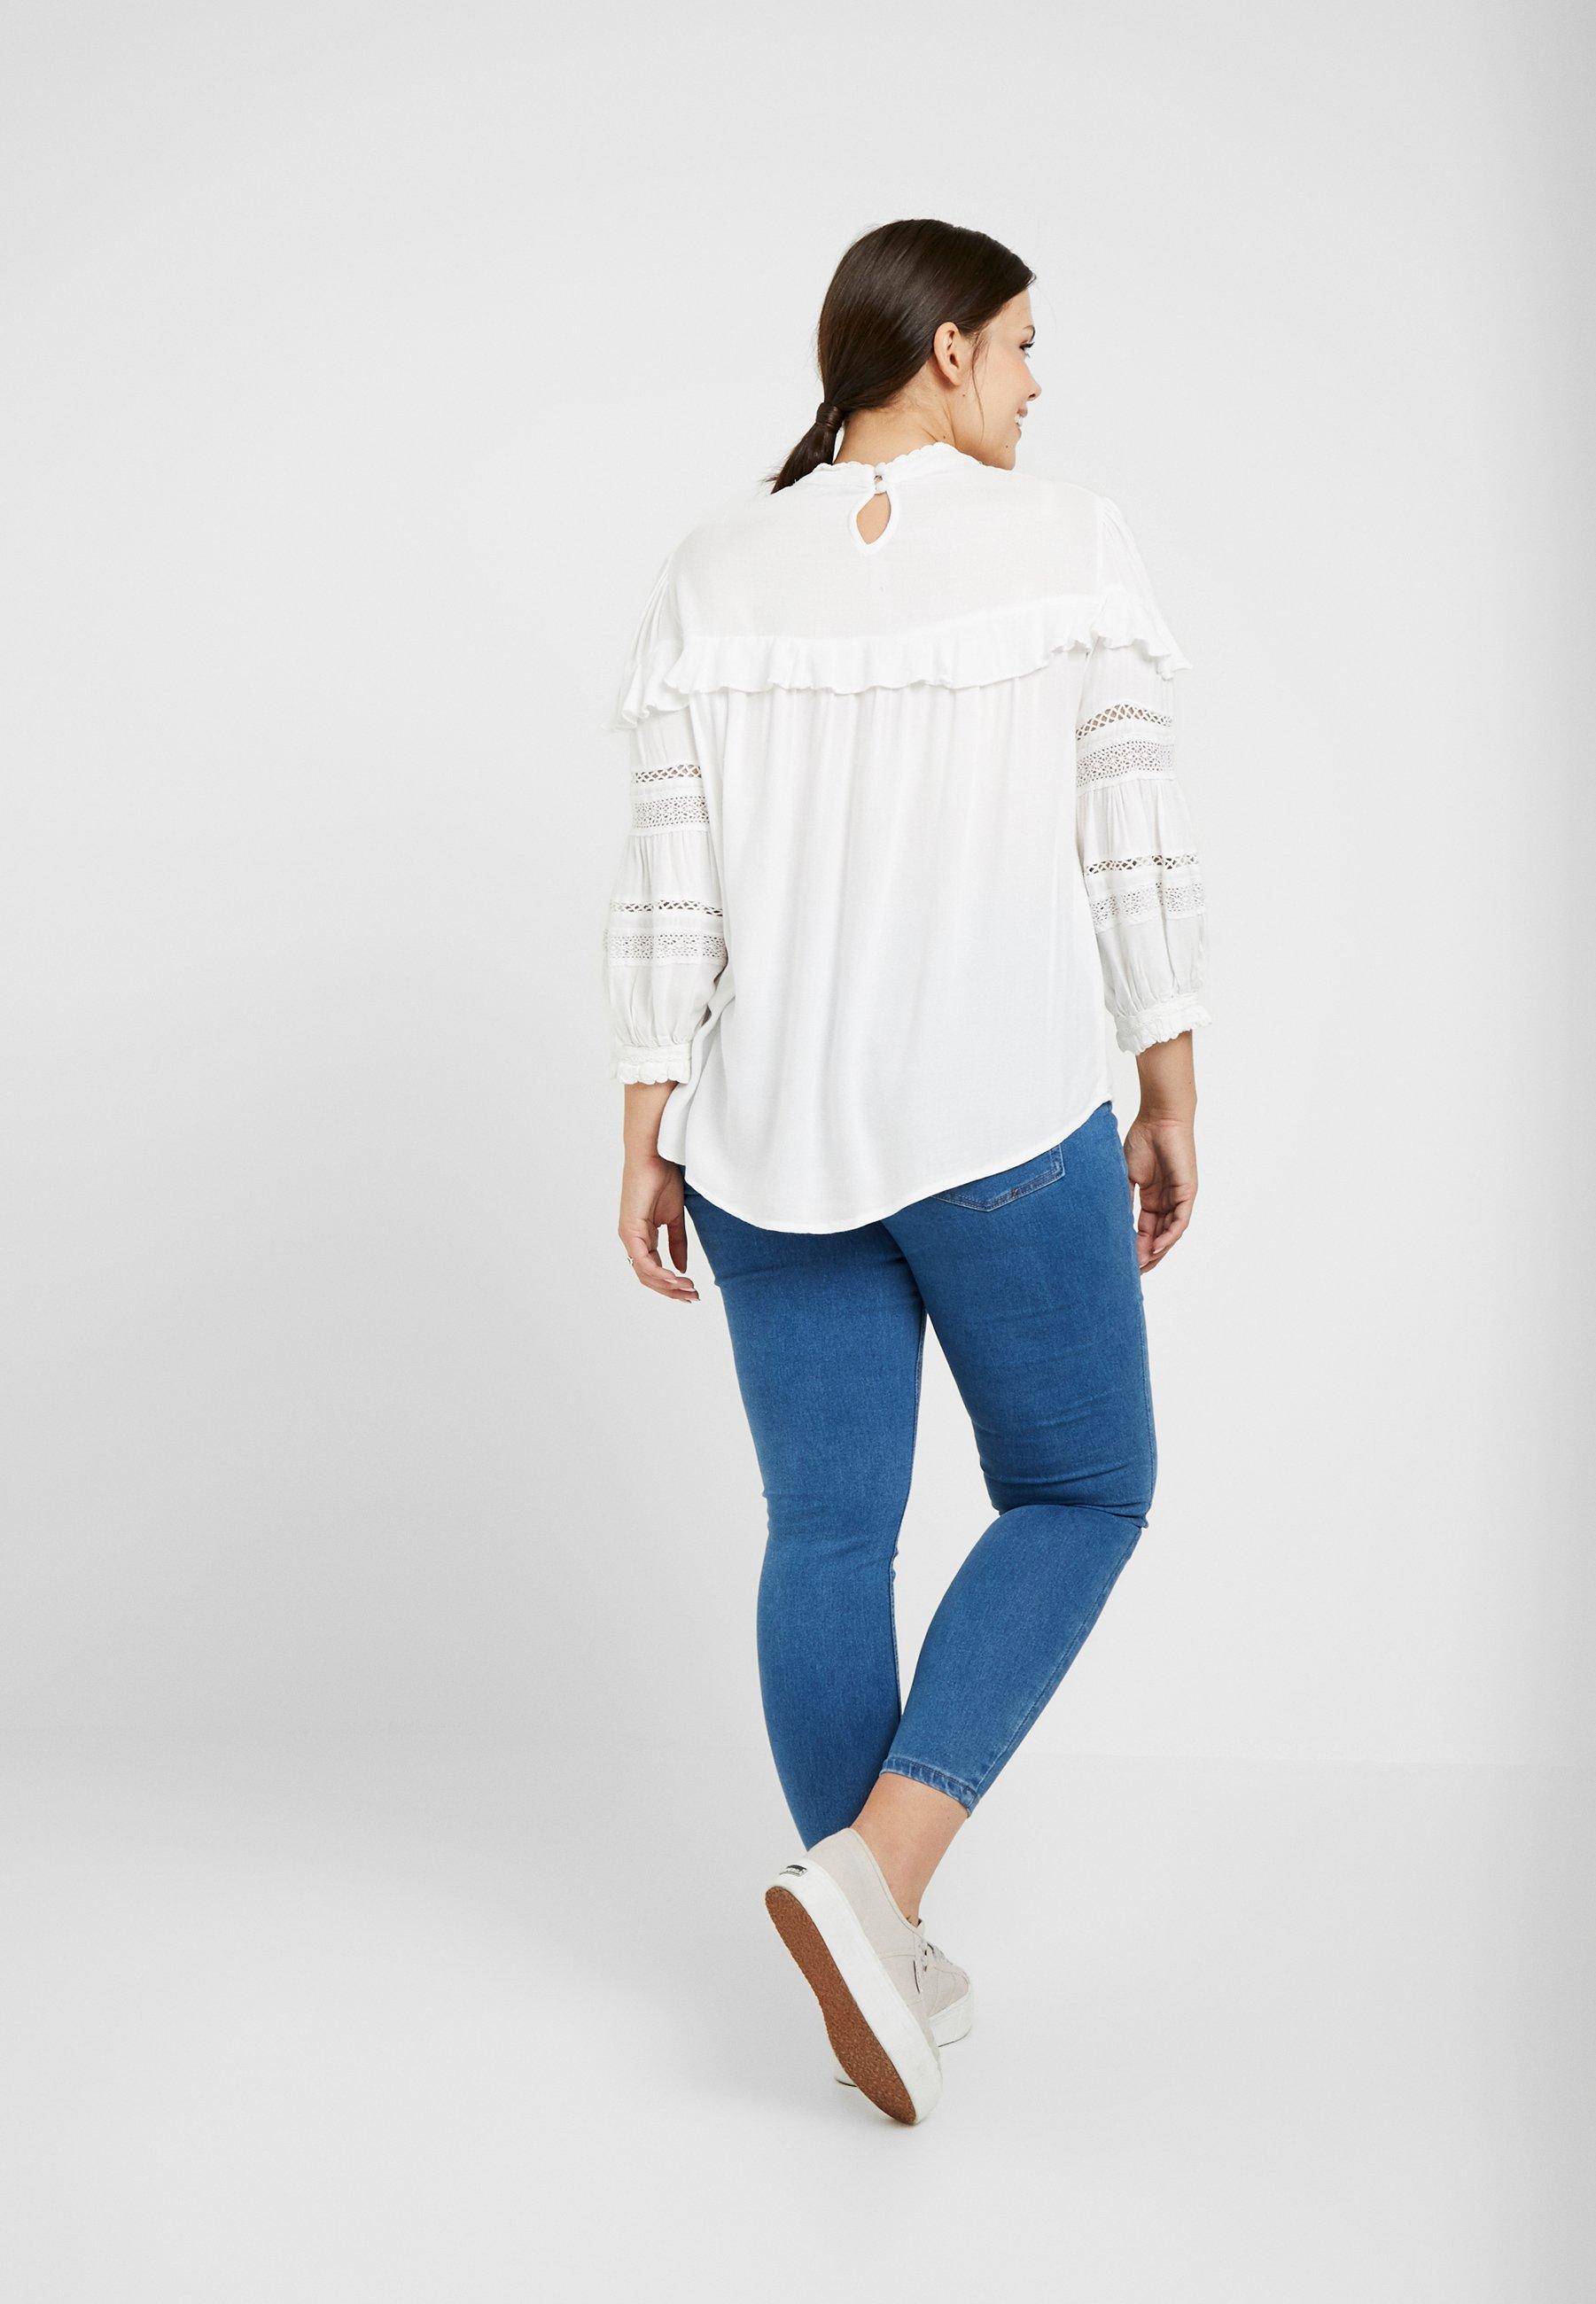 White 4 Manches 3 À Curve Dorothy Perkins SleeveT shirt Longues Ivory USjLqzMVpG